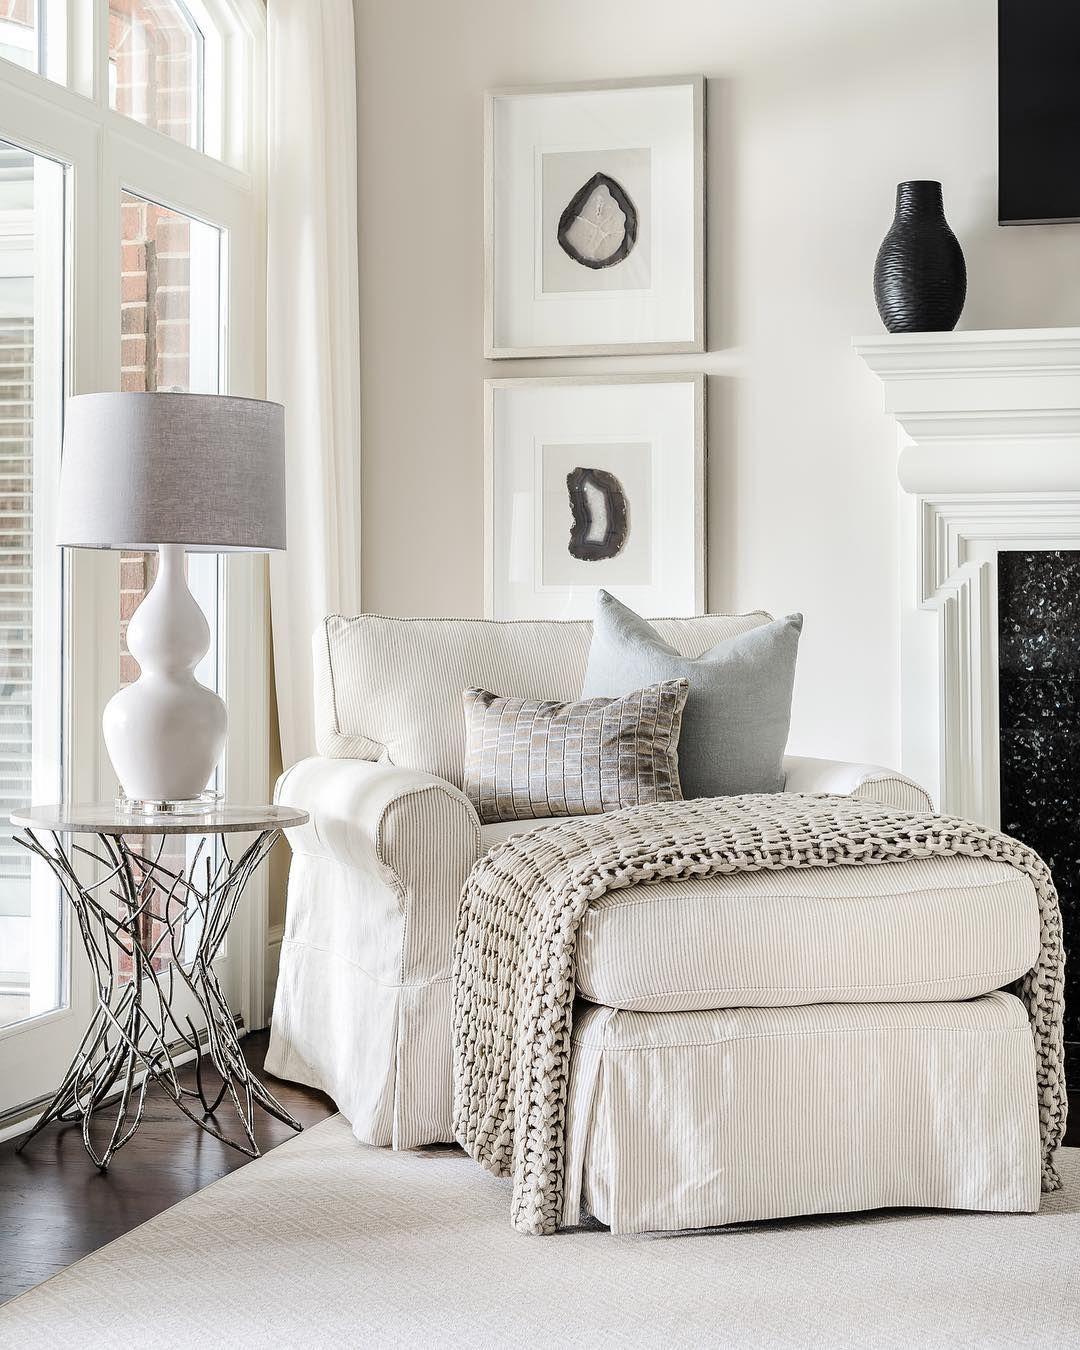 Beautiful Bedroom Sitting Areas: FINN THROW - 4 Colors In 2020